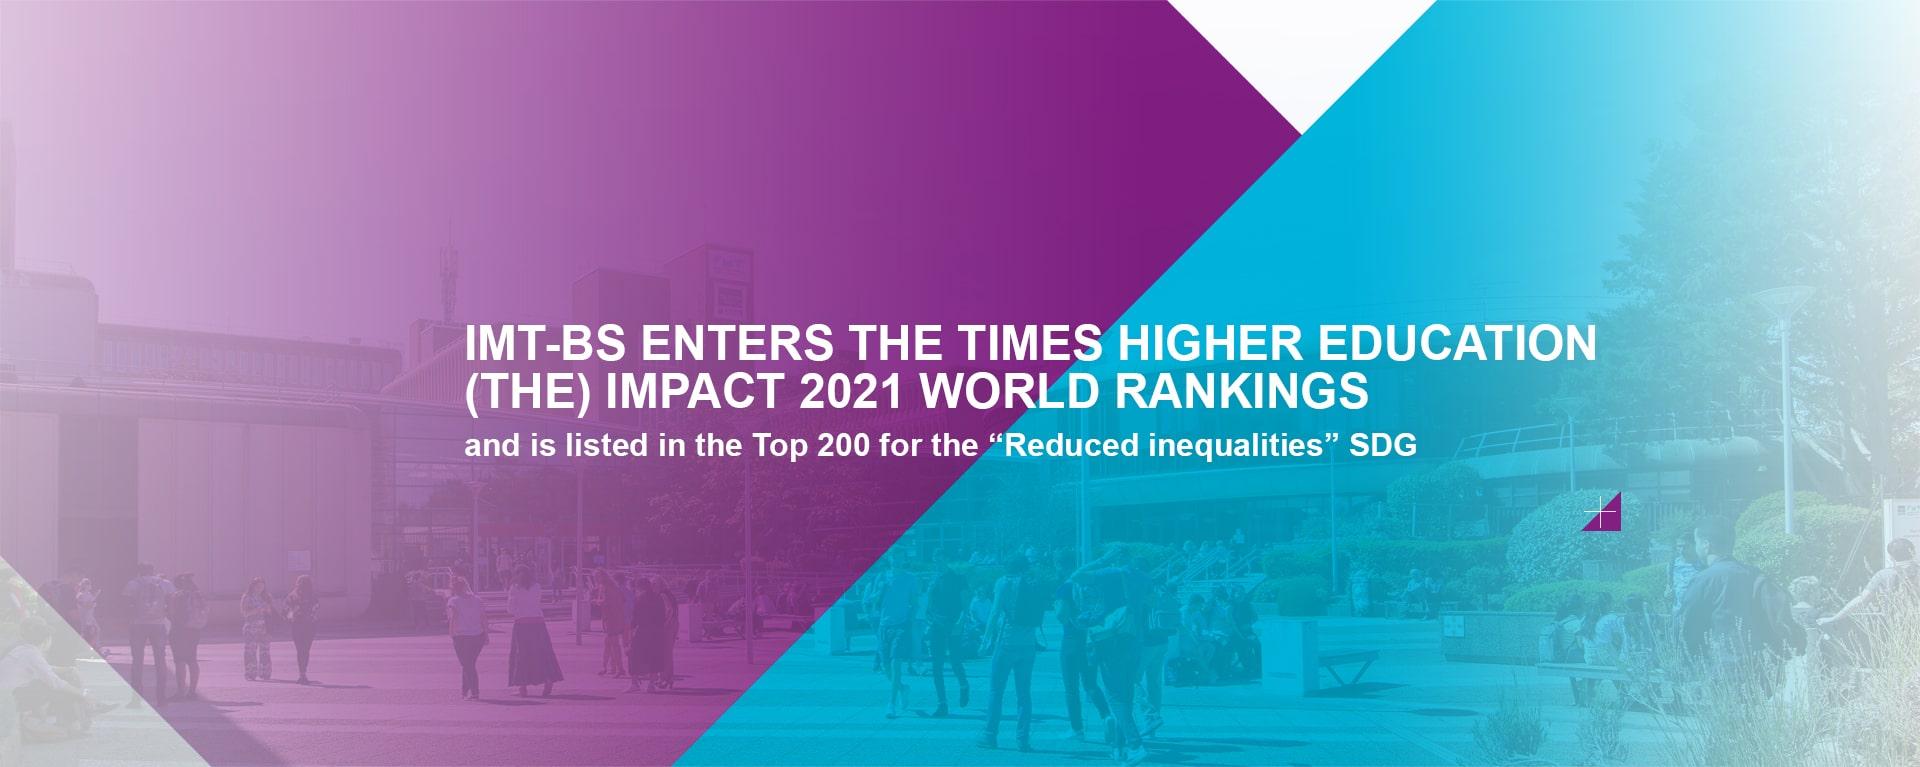 THE Impact 2021